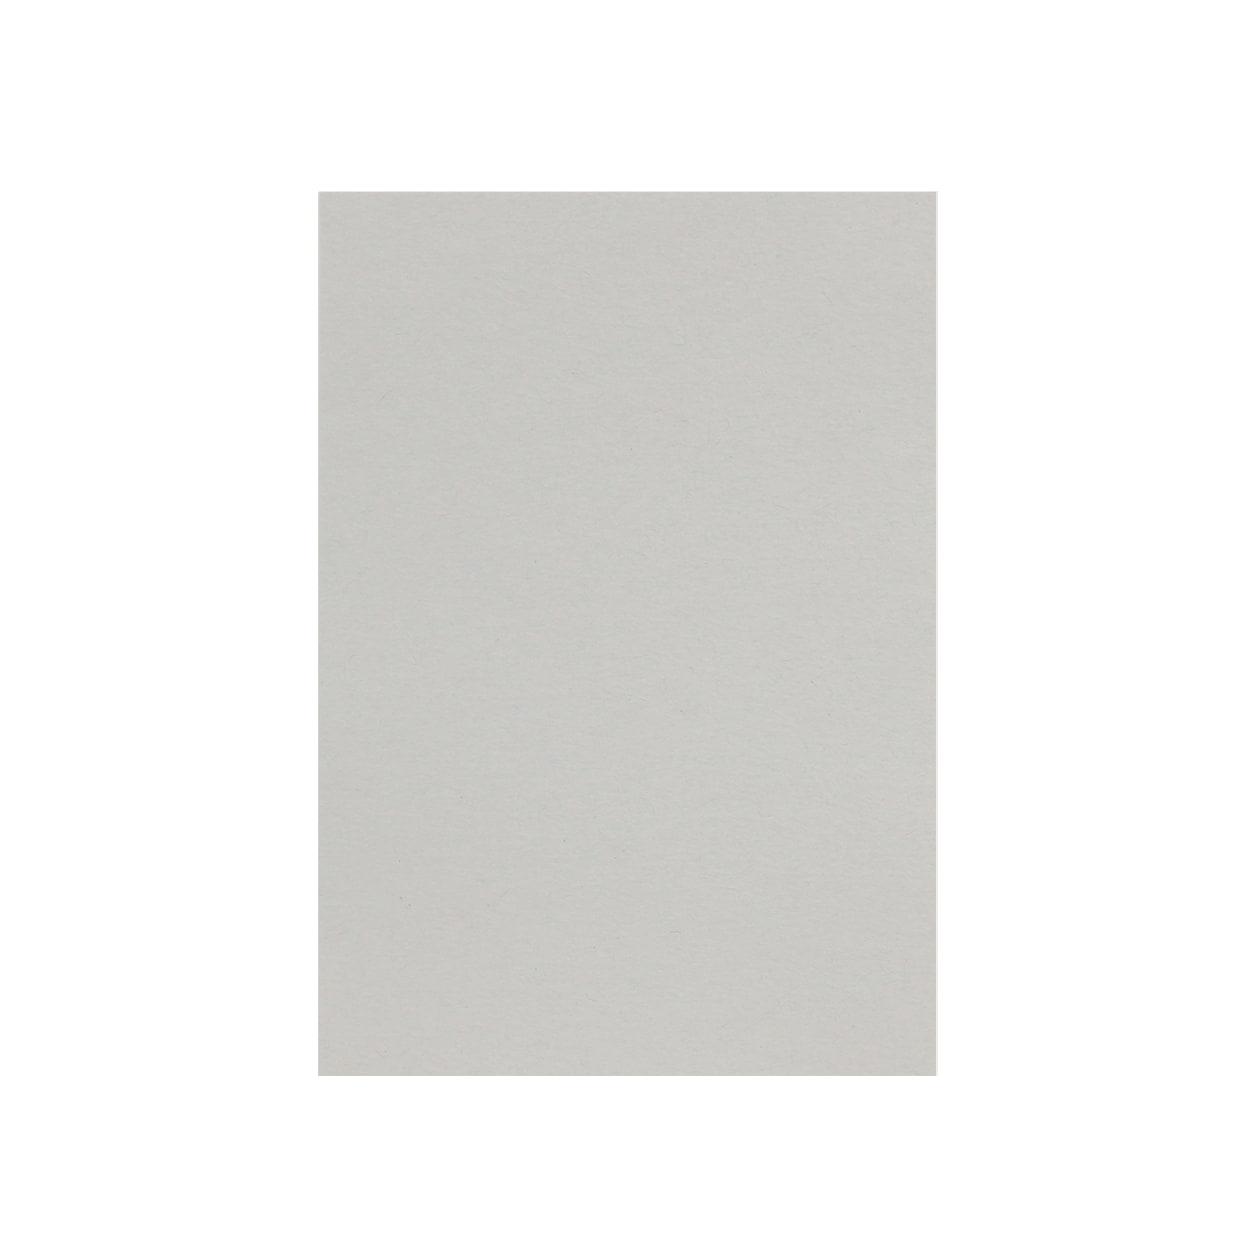 A6シール HAGURUMA Basic ライナーグレイ